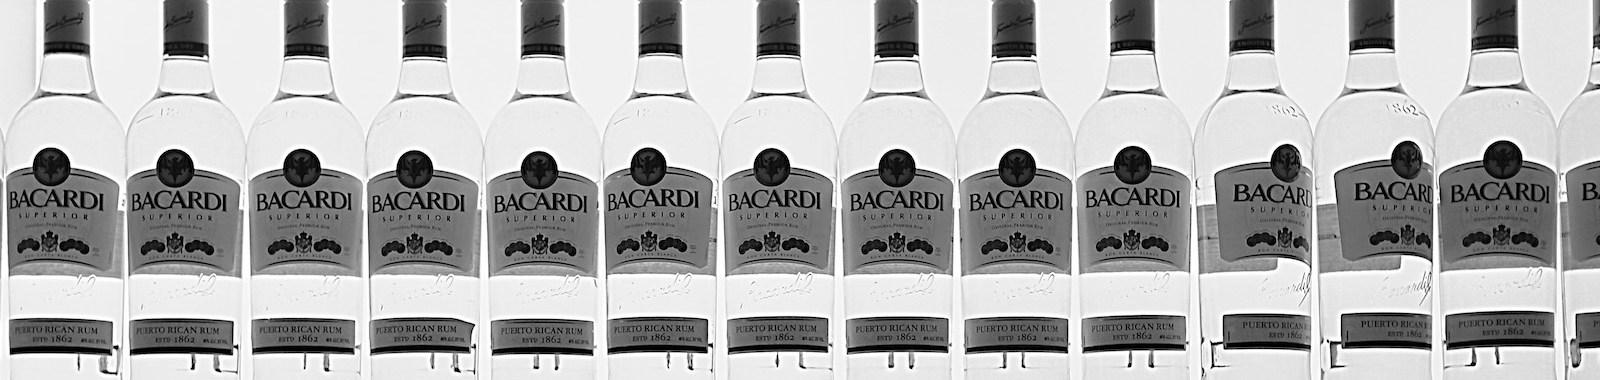 Bacardi_eye